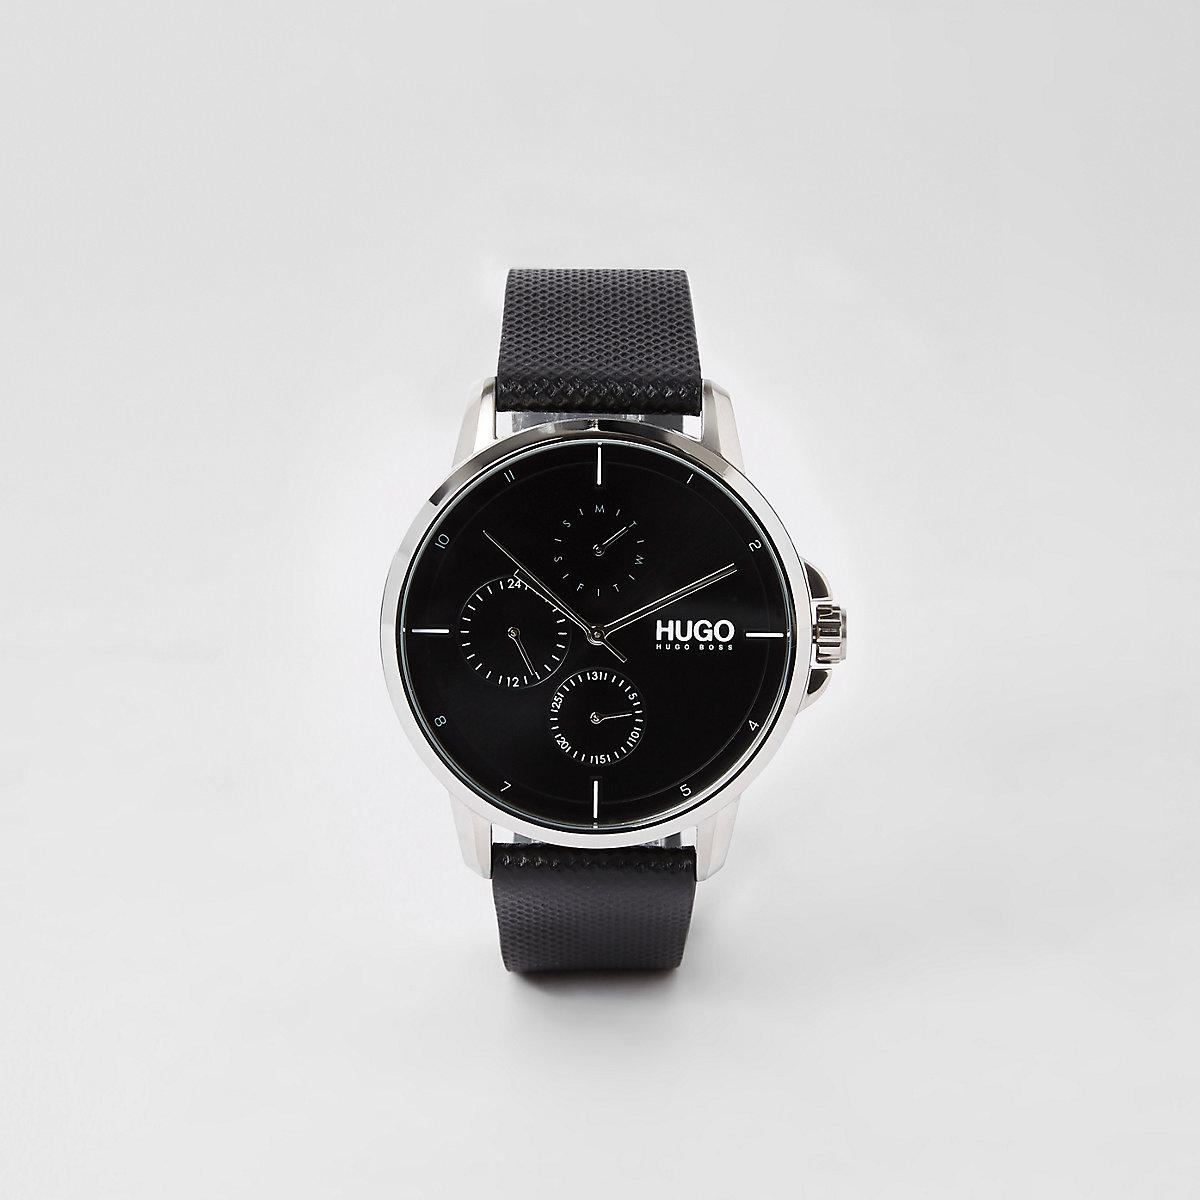 Hugo Boss black stainless steel watch